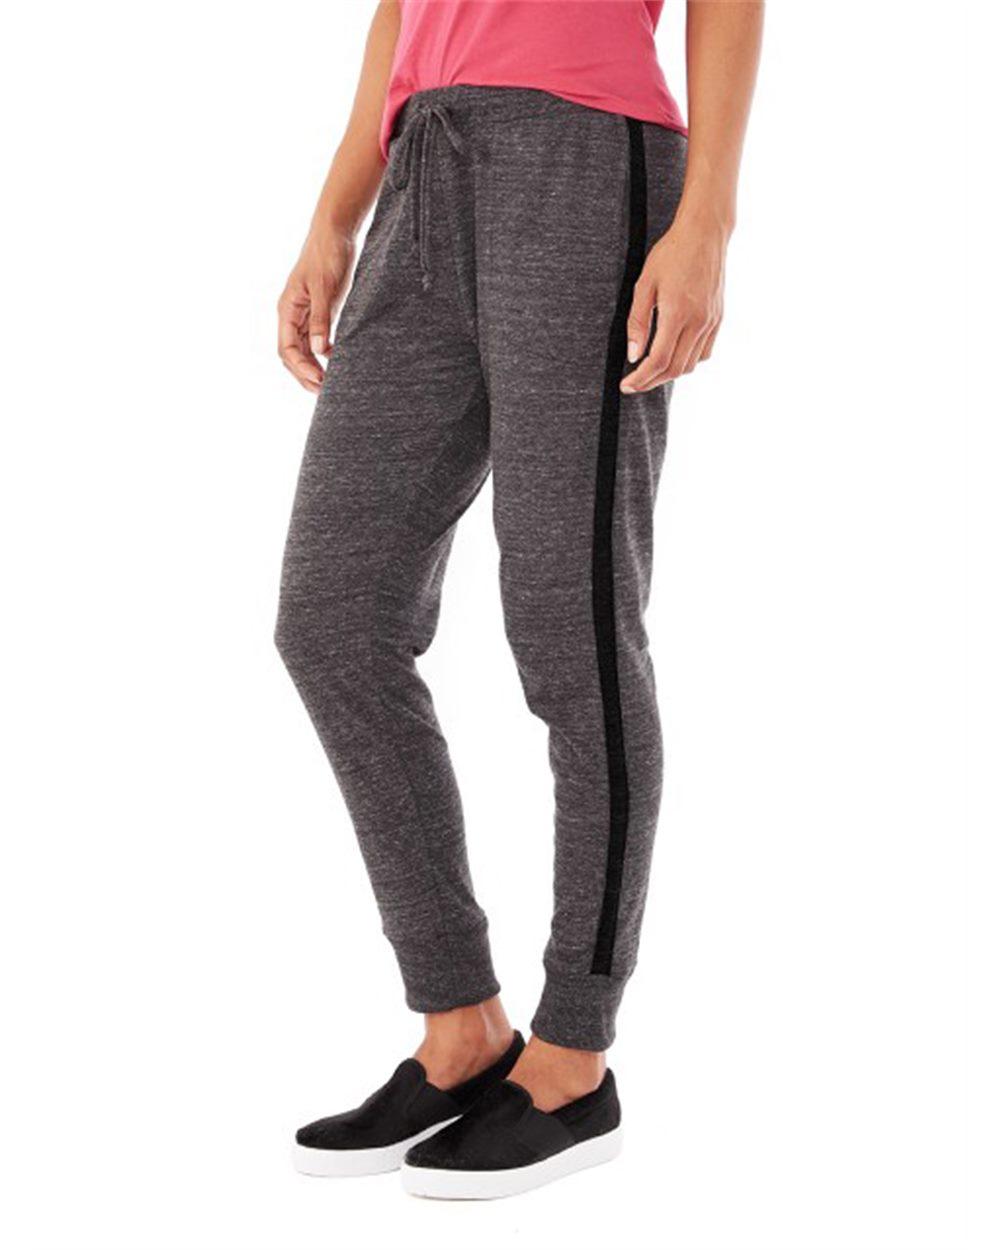 Best Jogger Pants - Alternative Apparel